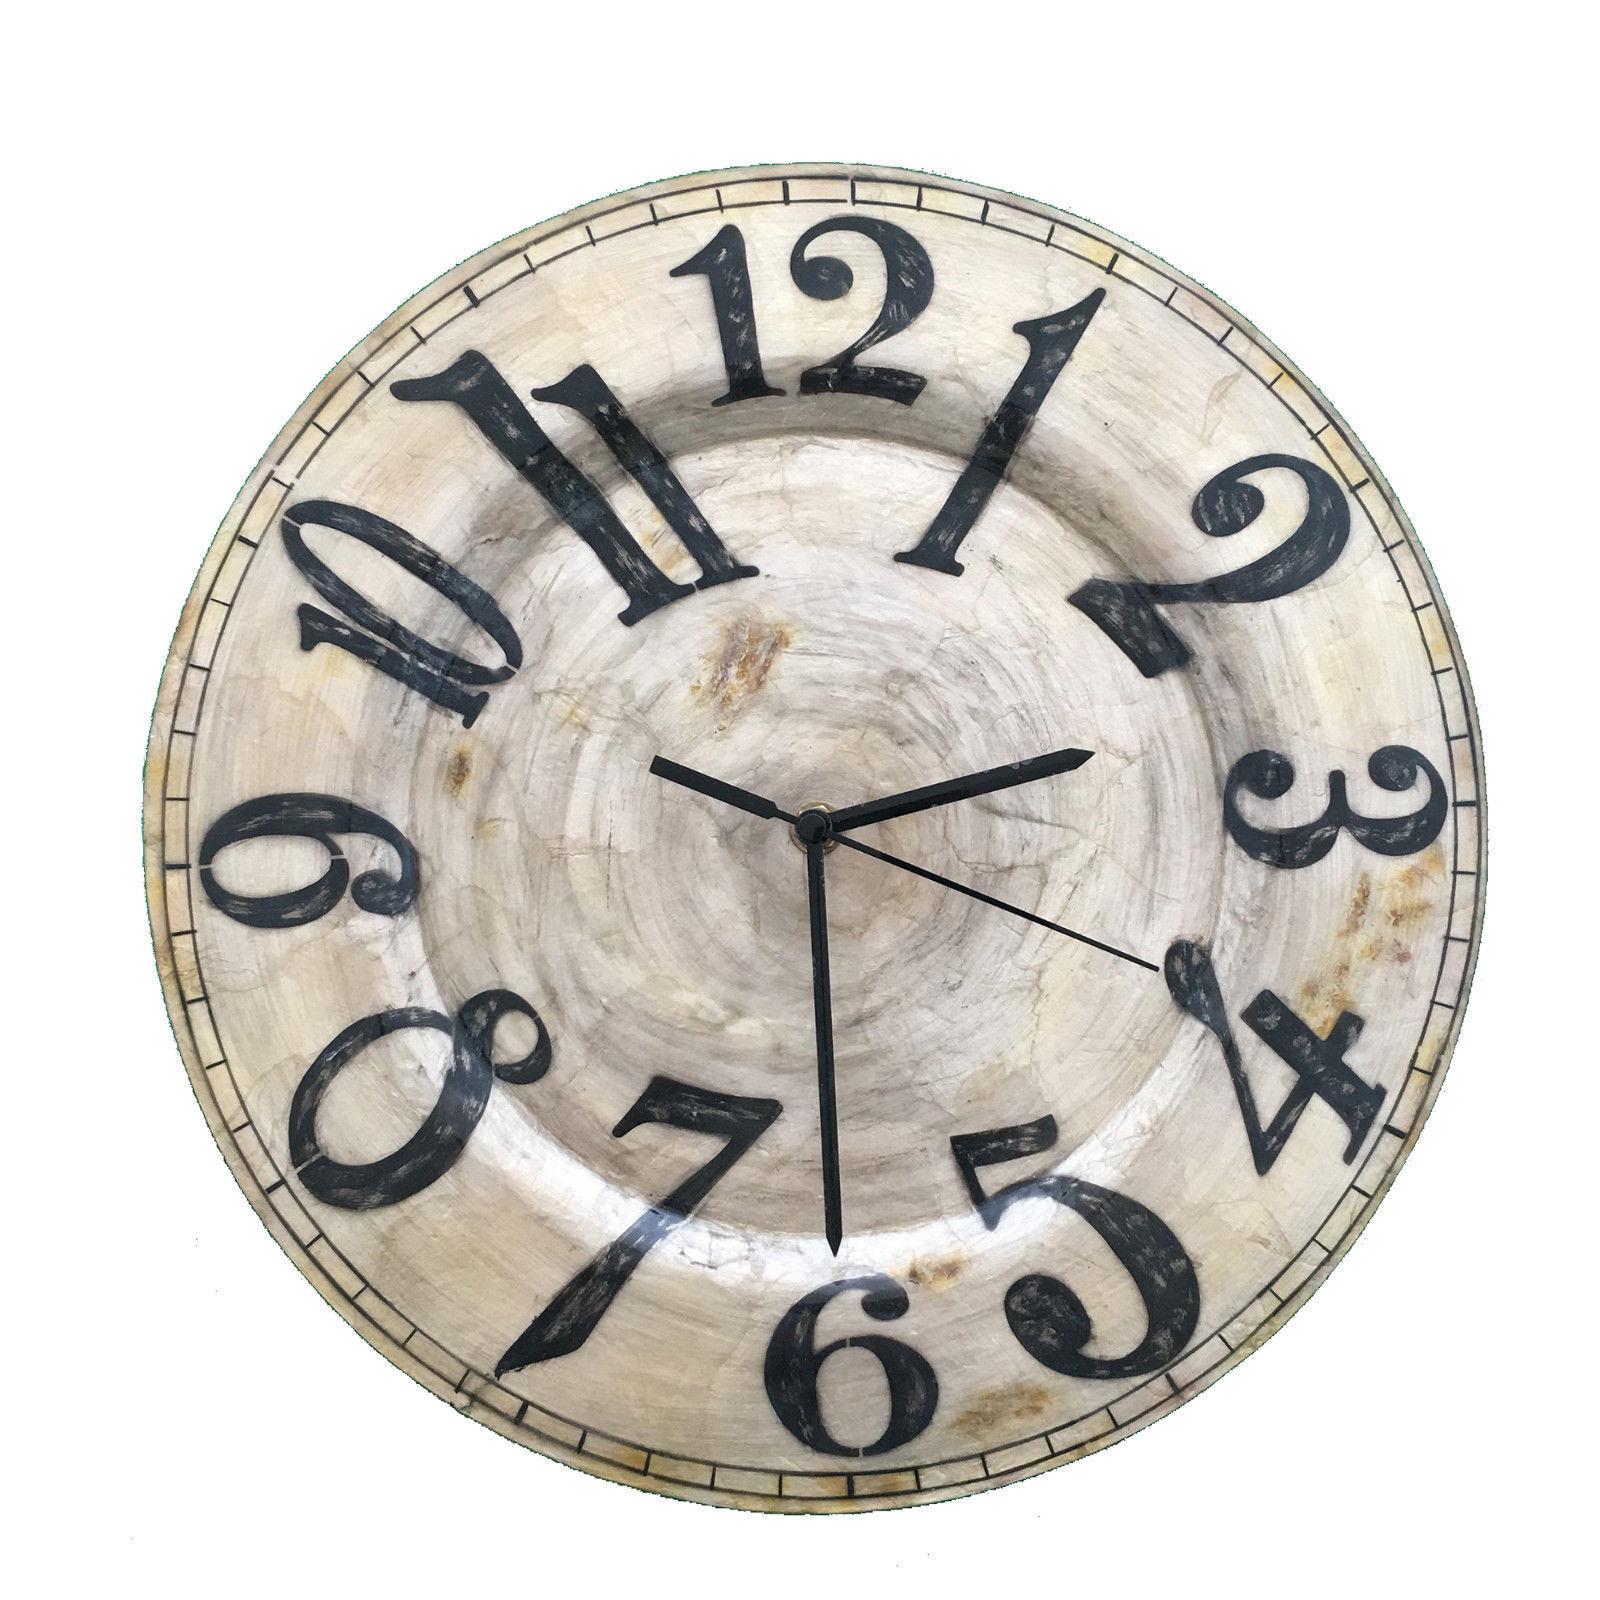 Eangee Home Design Indoor Outdoor Handpainted Wall Clock Pearl Black Numbers